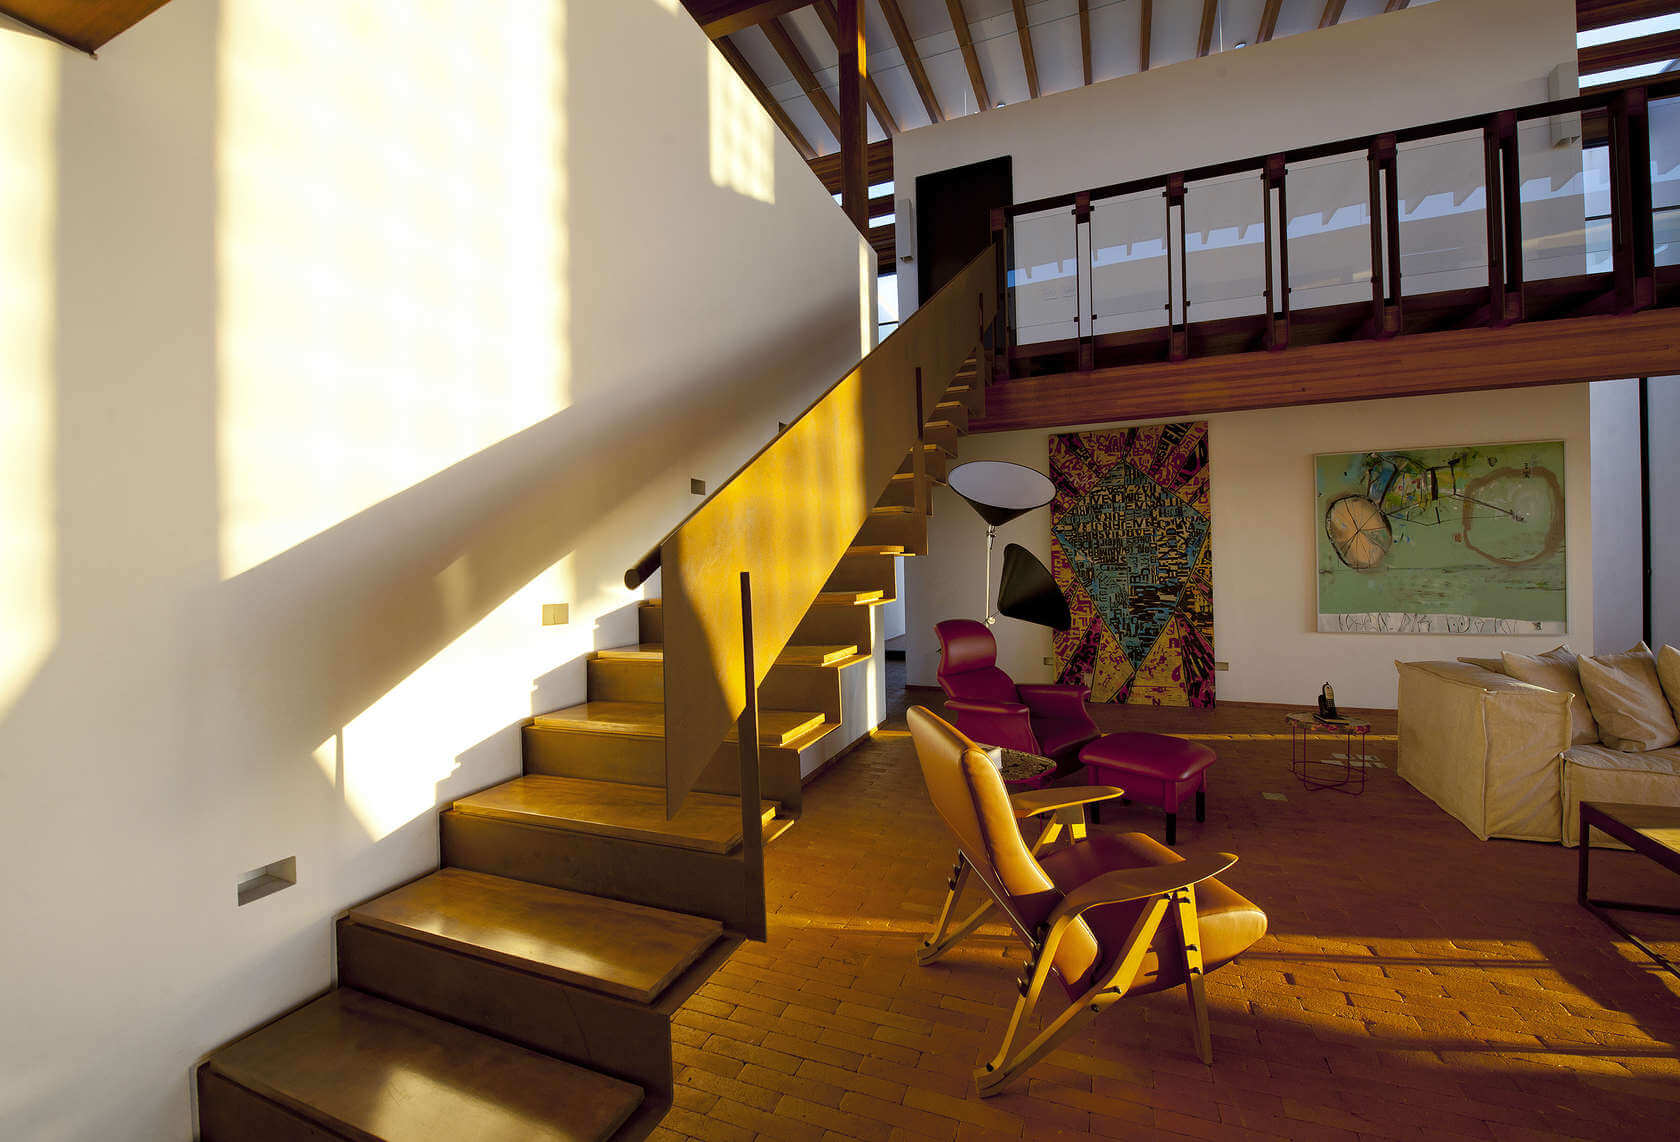 quinta-da-baroneza-candida-tabet-arquitetura-22